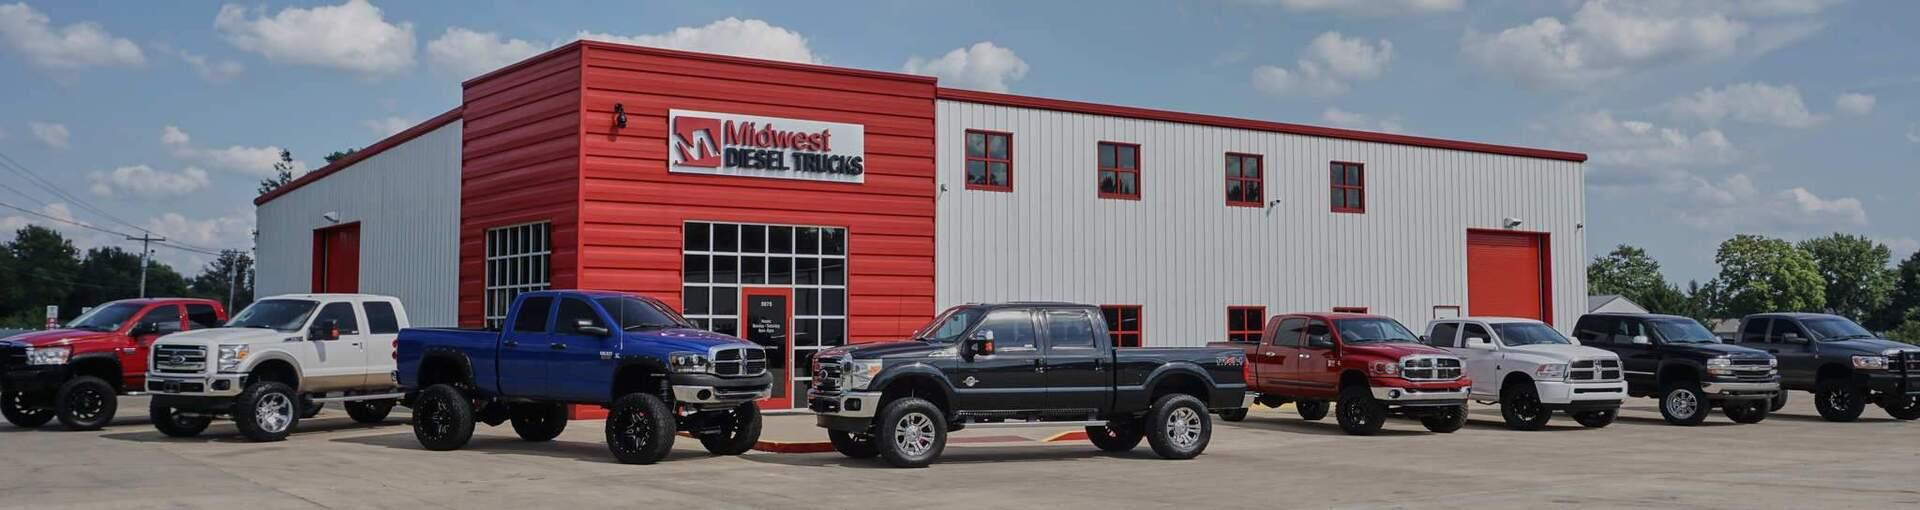 Quality Pick Ups At Midwest Diesel Trucks